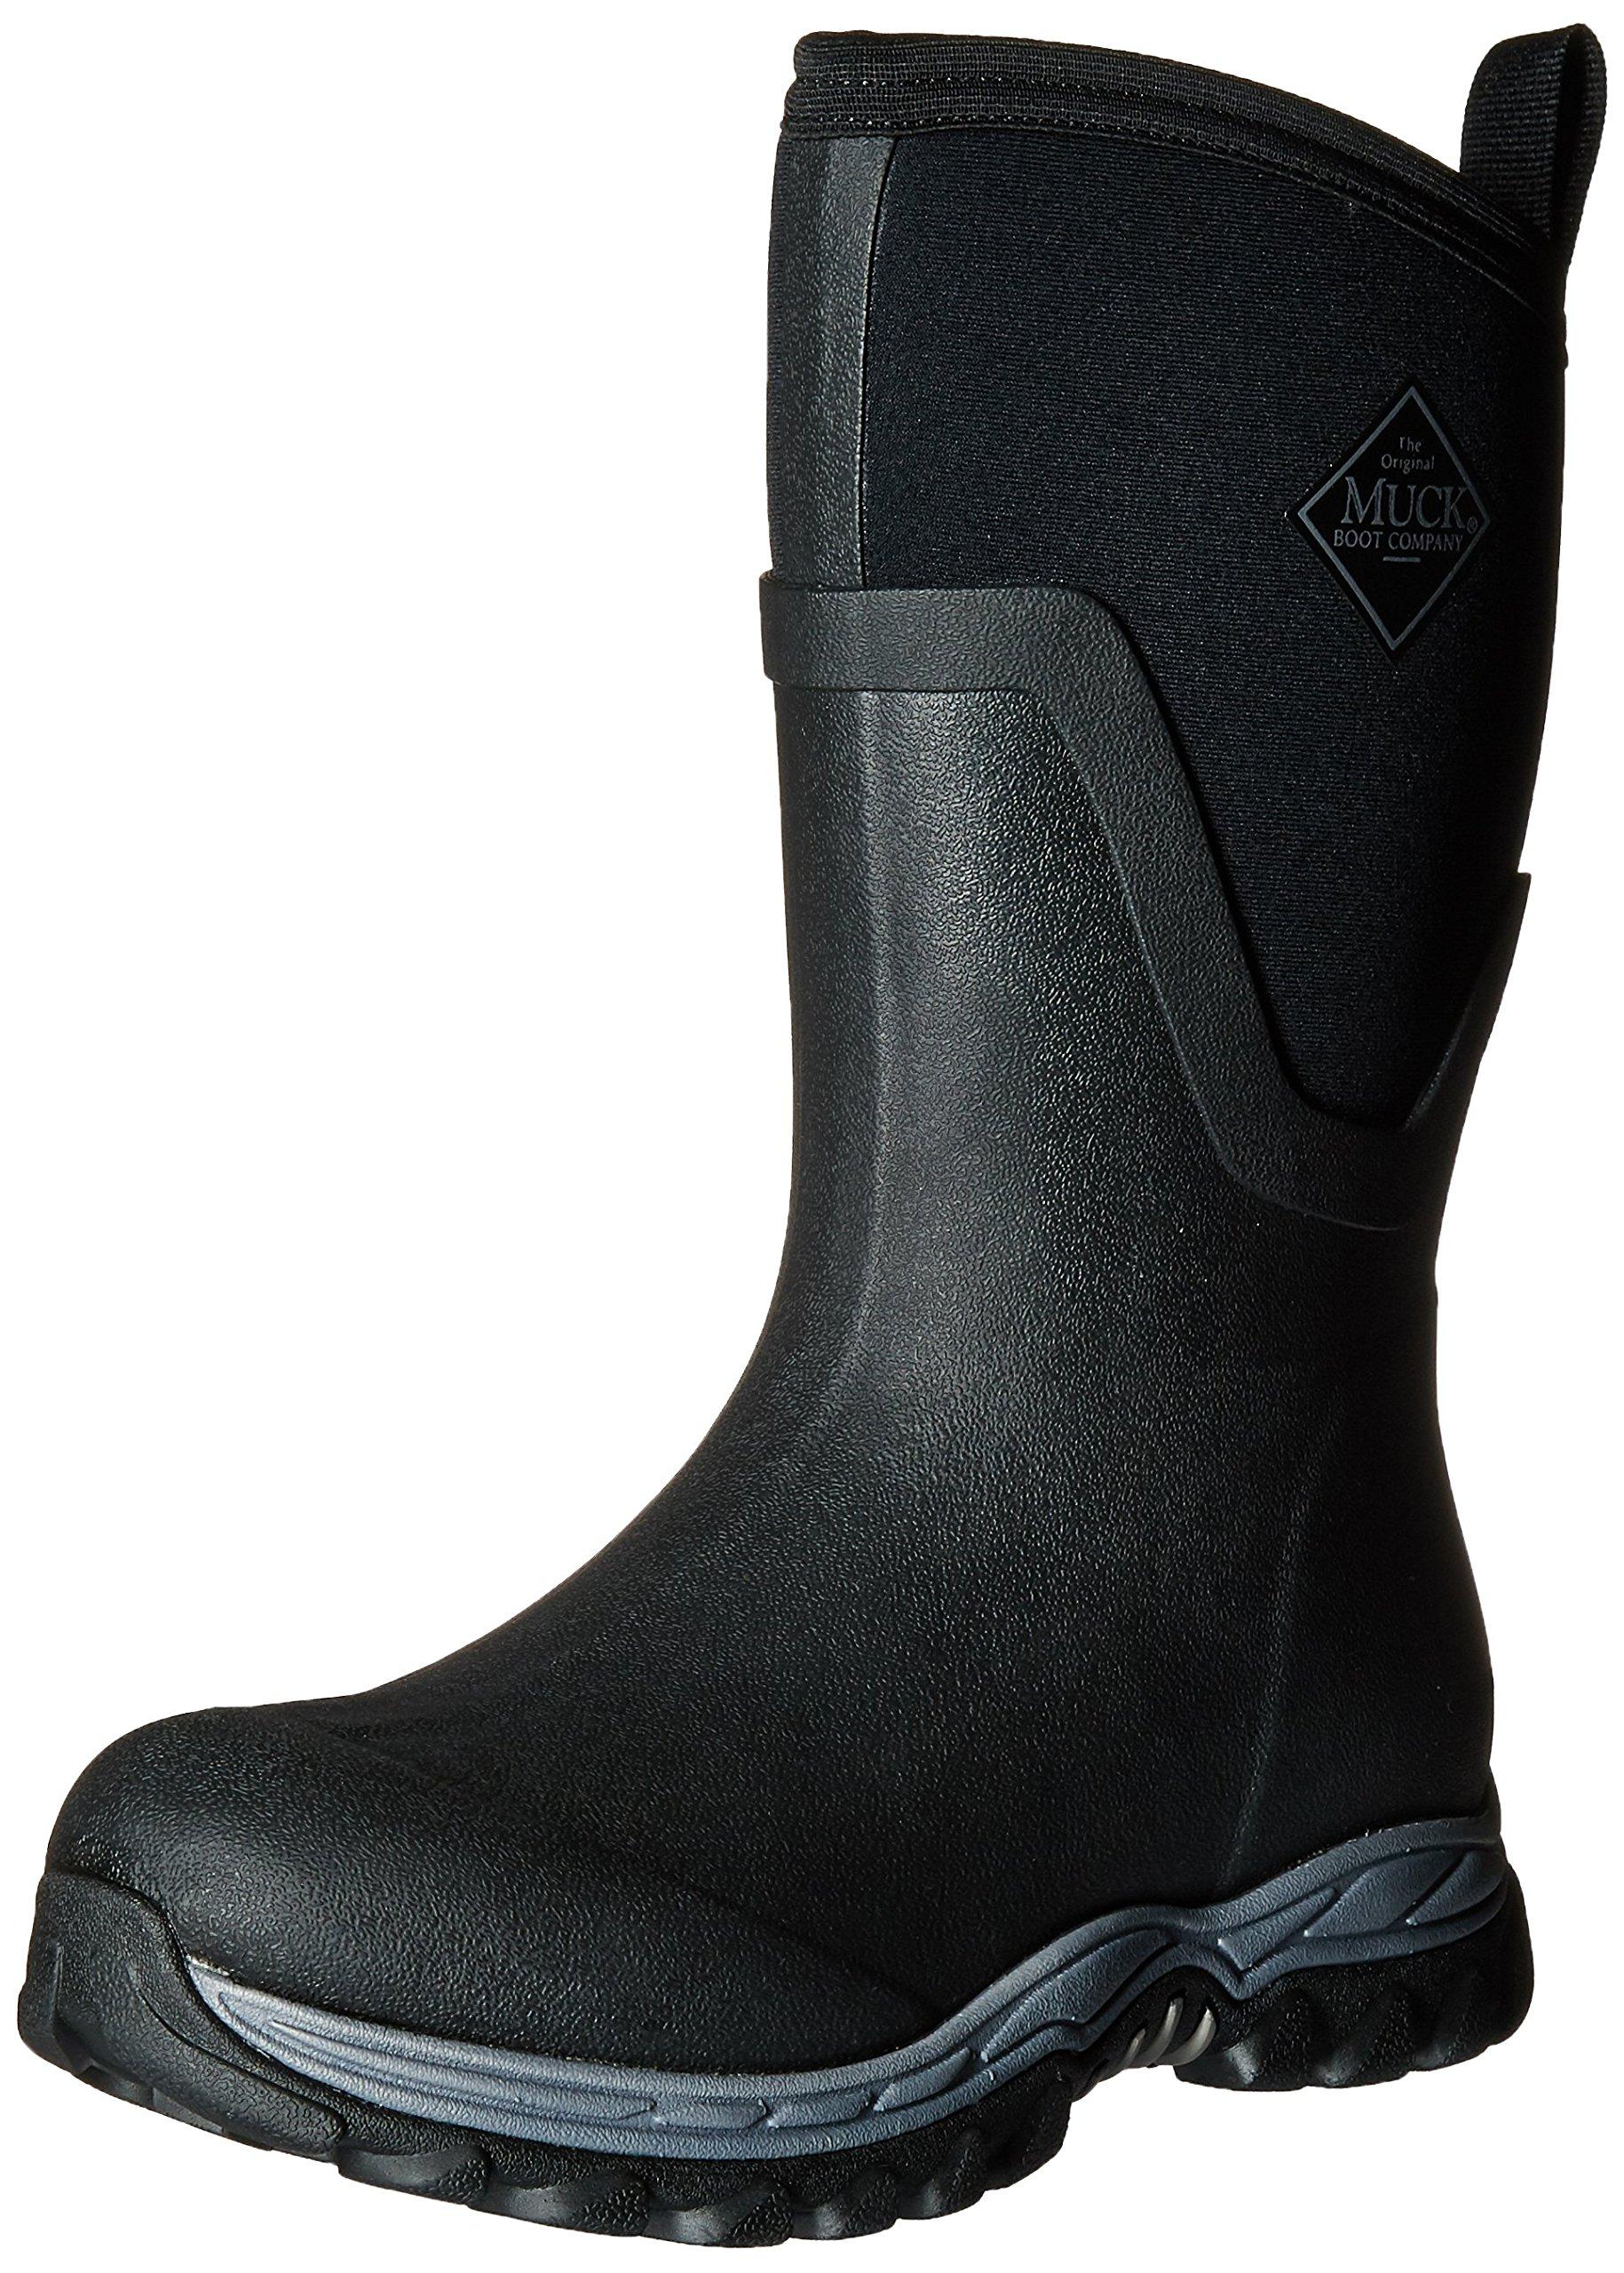 Pluie Ii MidBottesamp; Bottines Black36 Arctic Eu FemmeNoir Muck De Boots Sport v8mwNn0